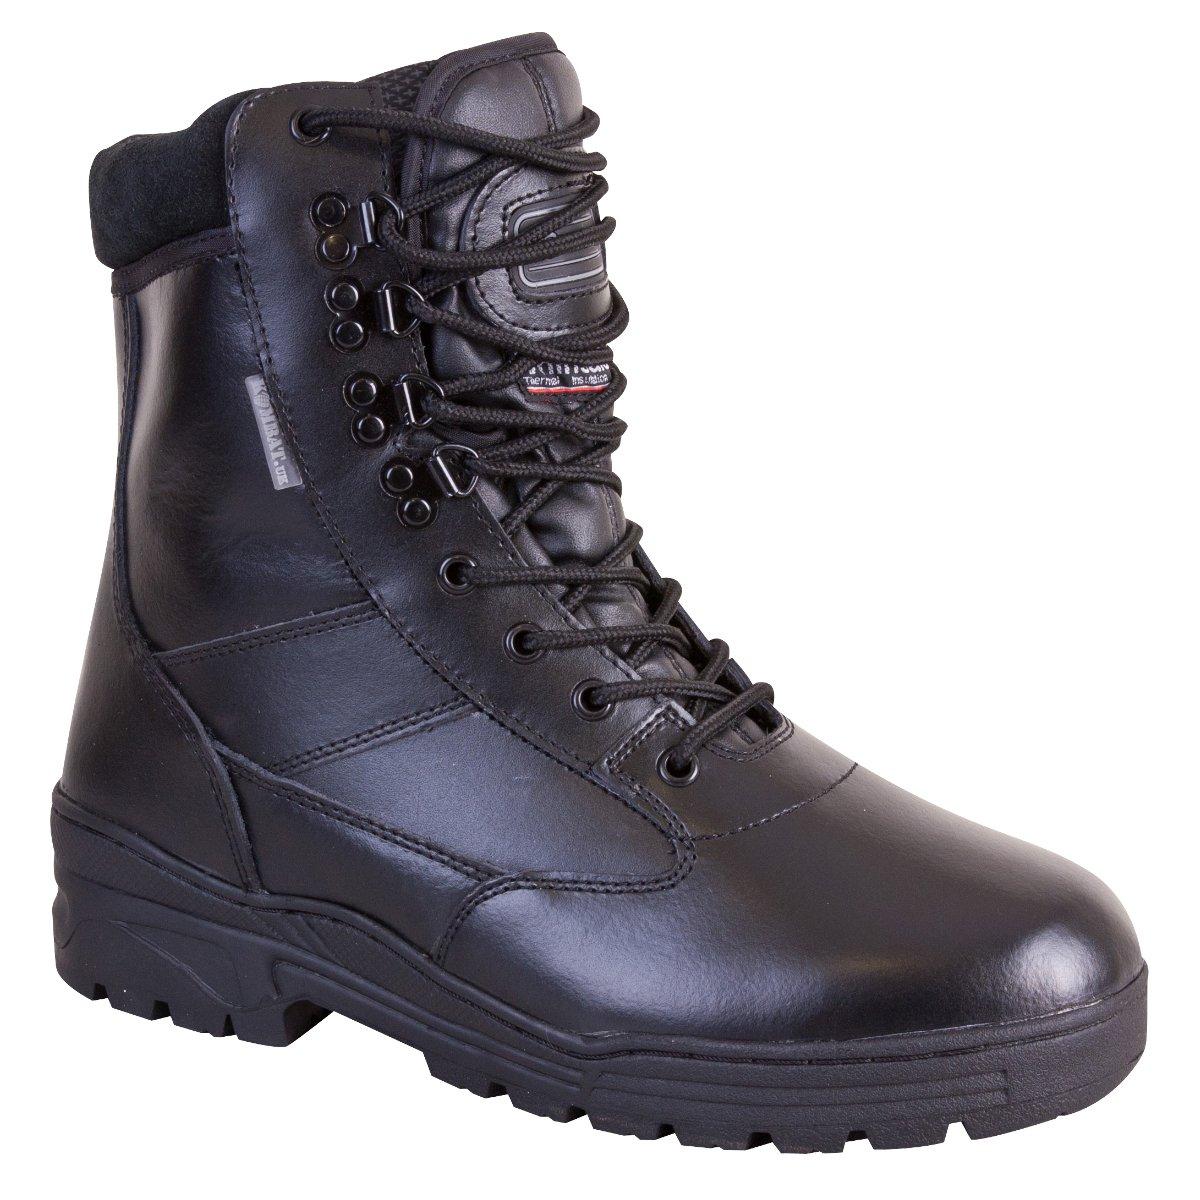 Kombat UK Men's All Leather Patrol Boots - Black